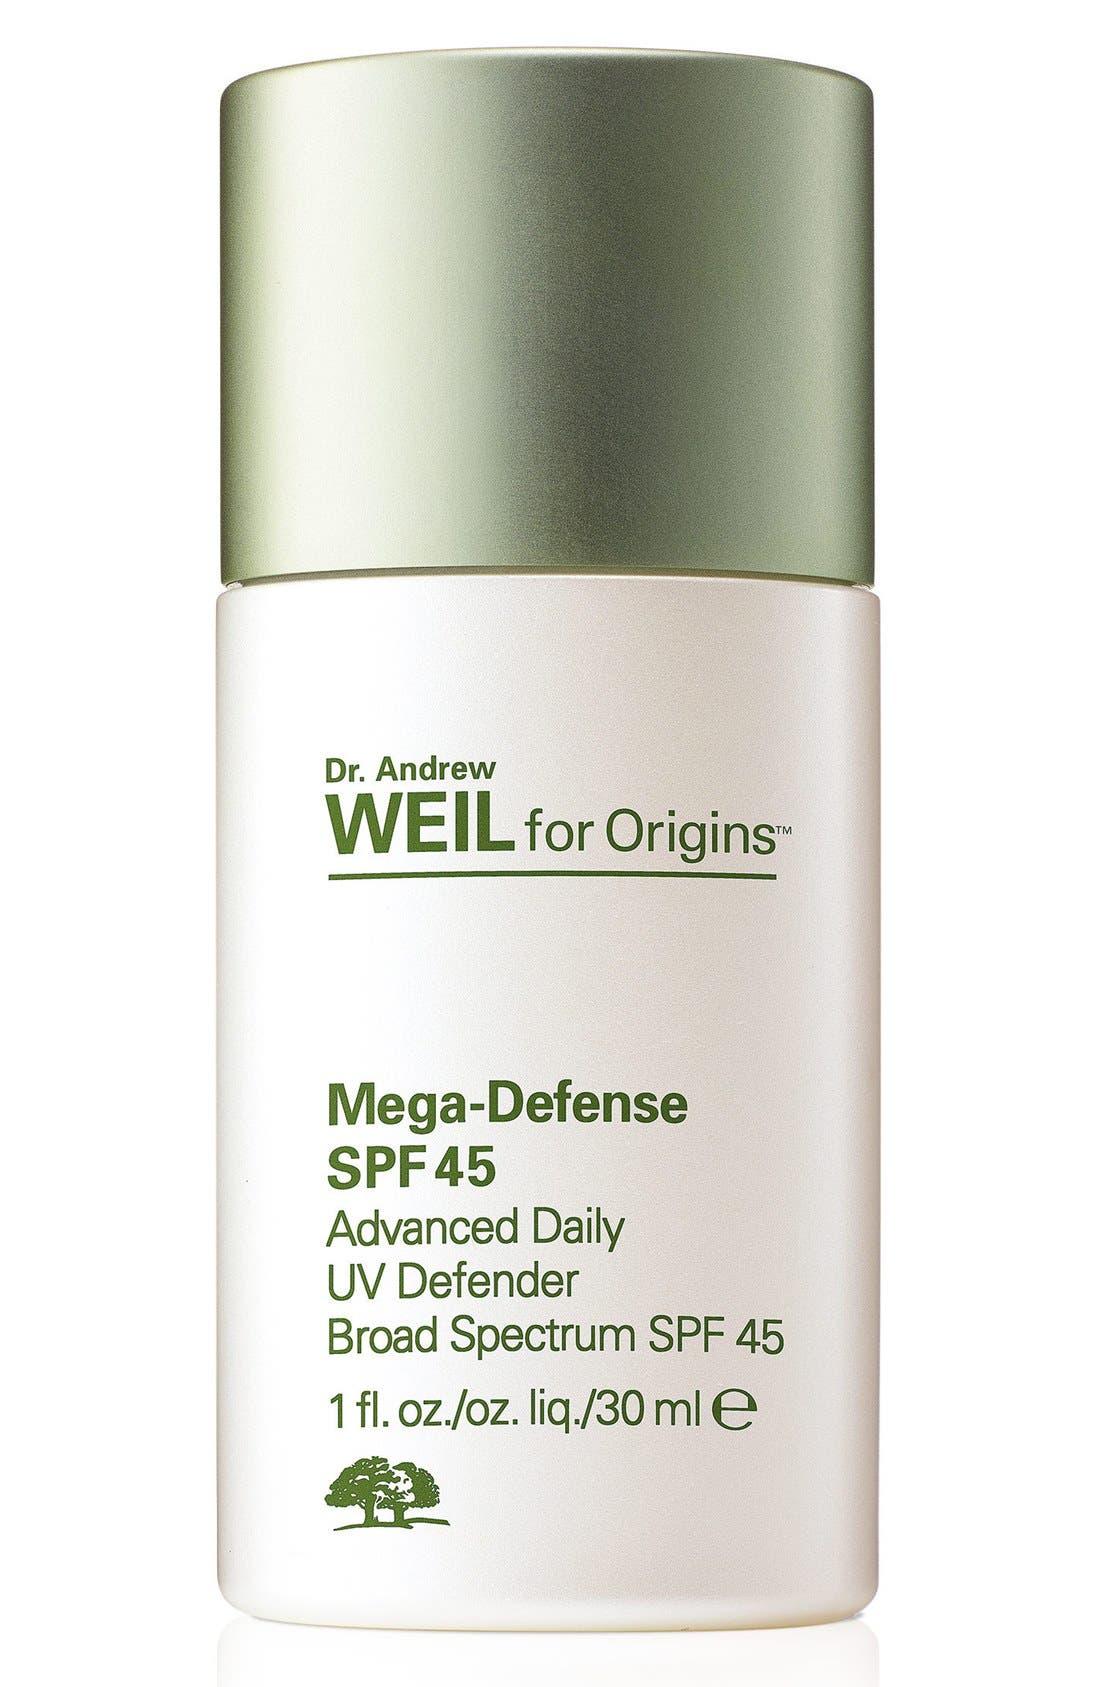 Origins Dr. Andrew Weil for Origins™ Mega-Defense Advanced Daily UV Defender SPF 45